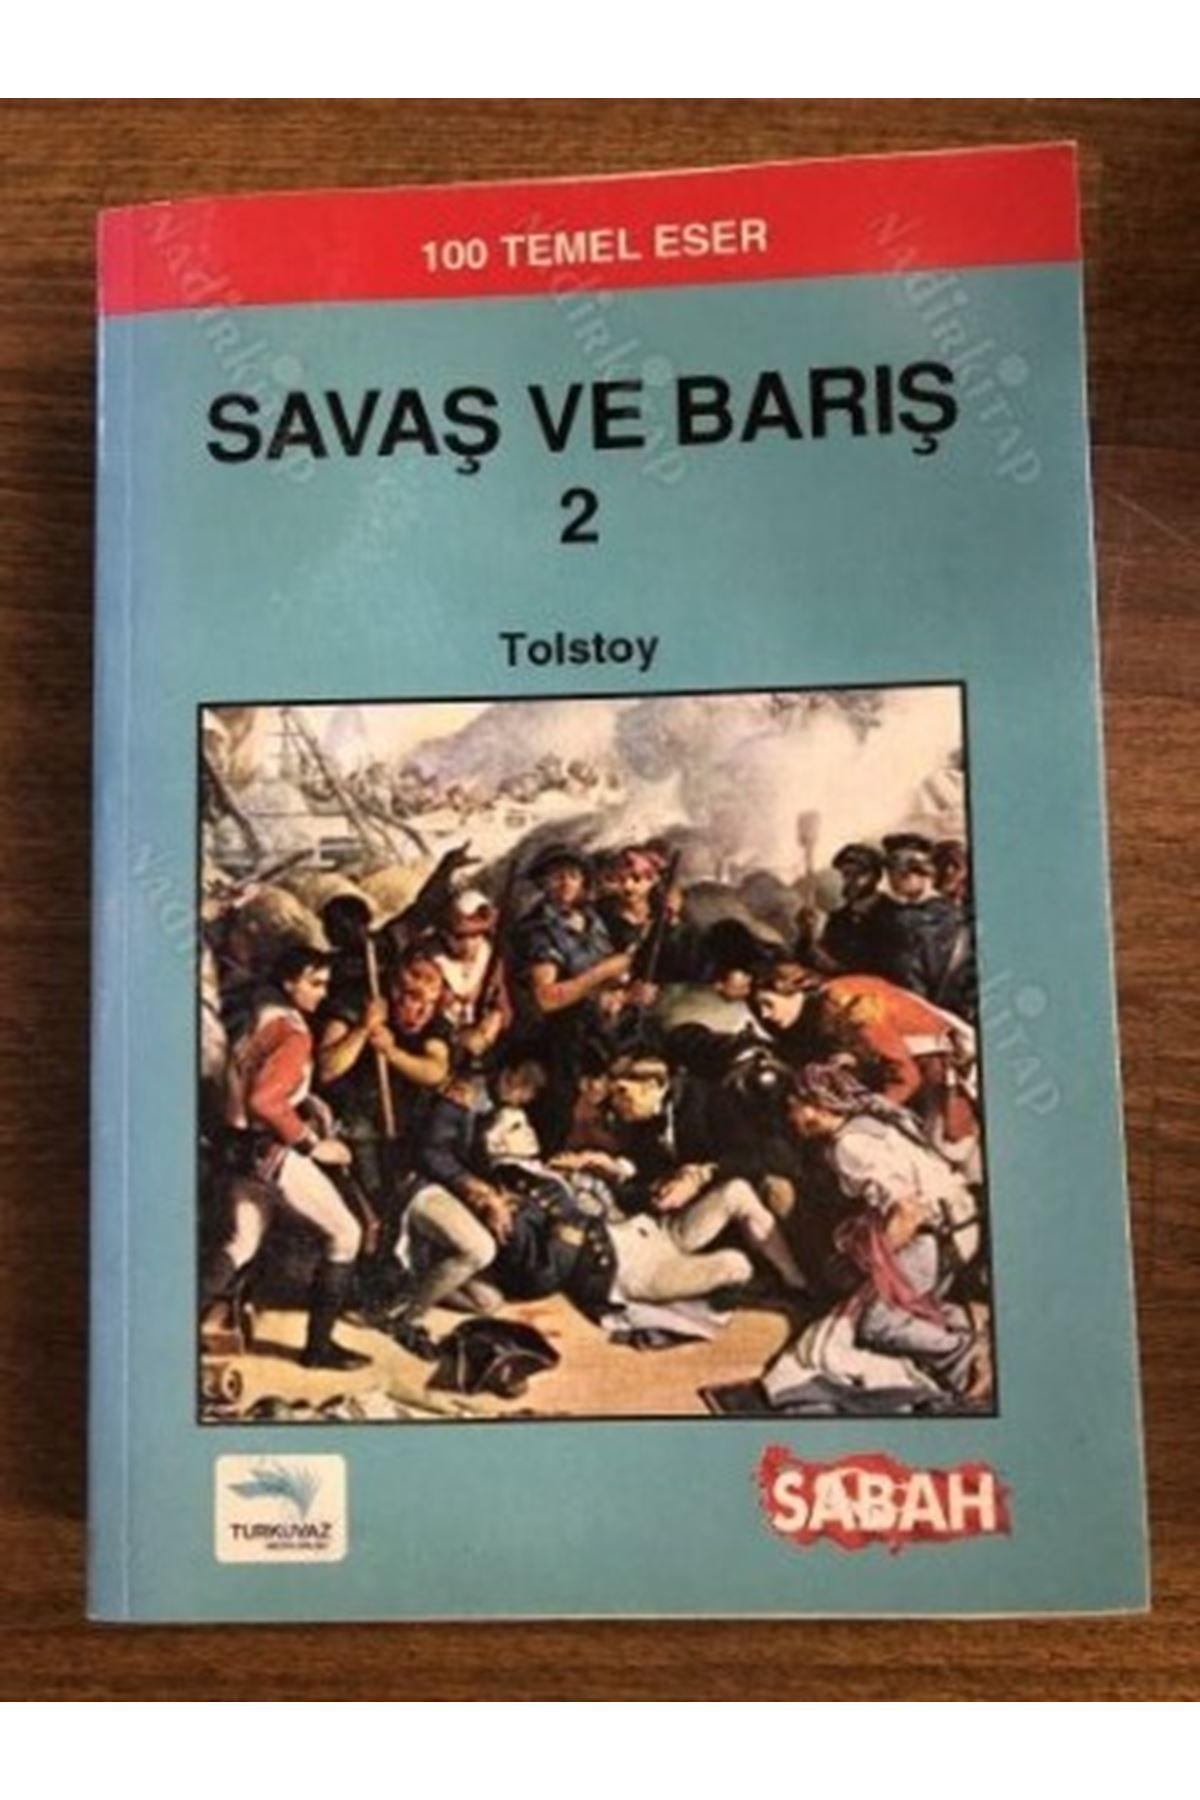 TOLSTOY -  SAVAŞ VE BARIŞ 2